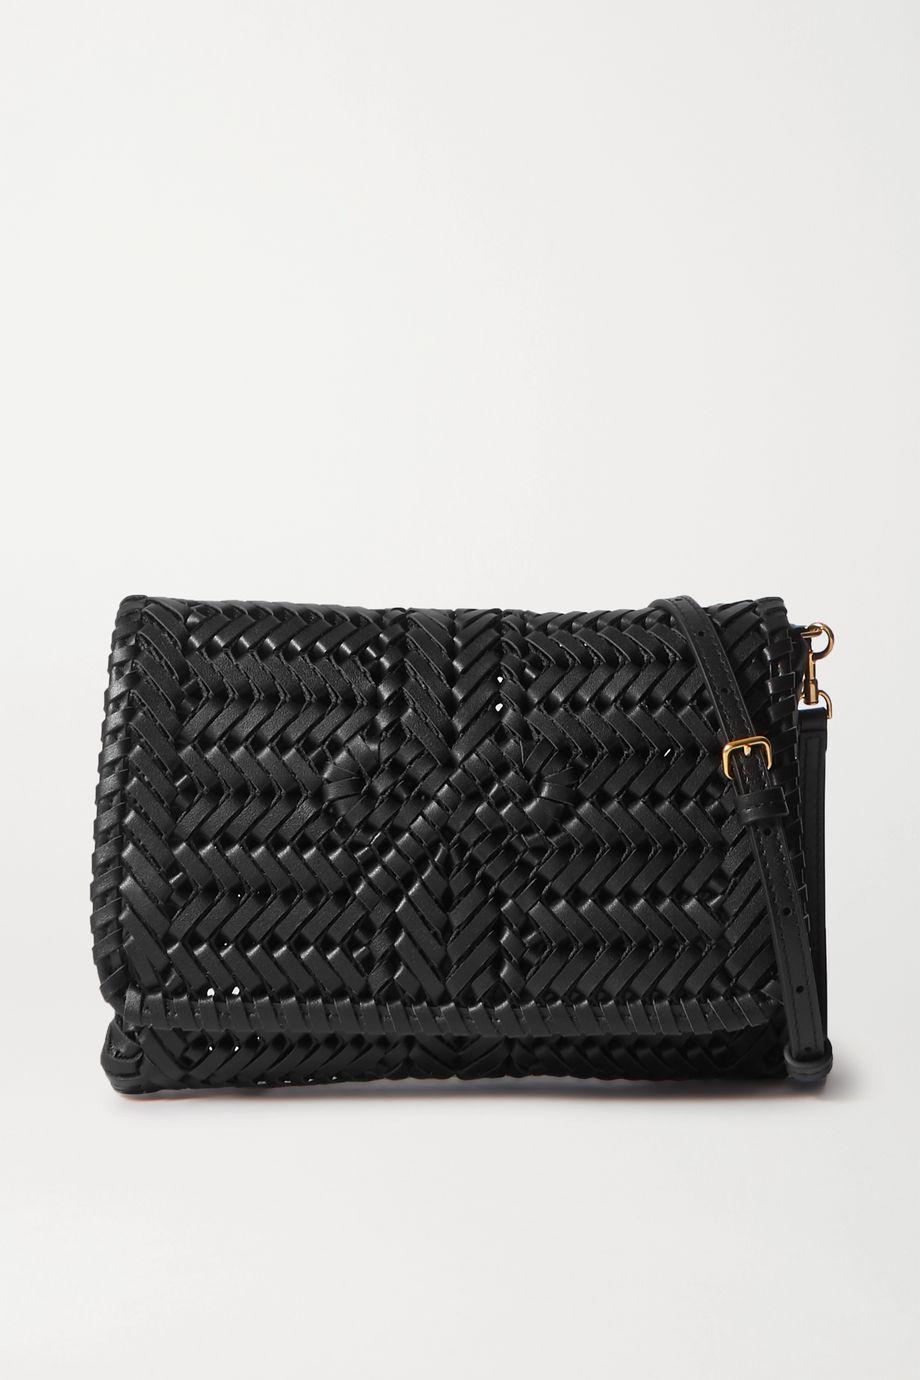 Anya Hindmarch Neeson woven leather shoulder bag